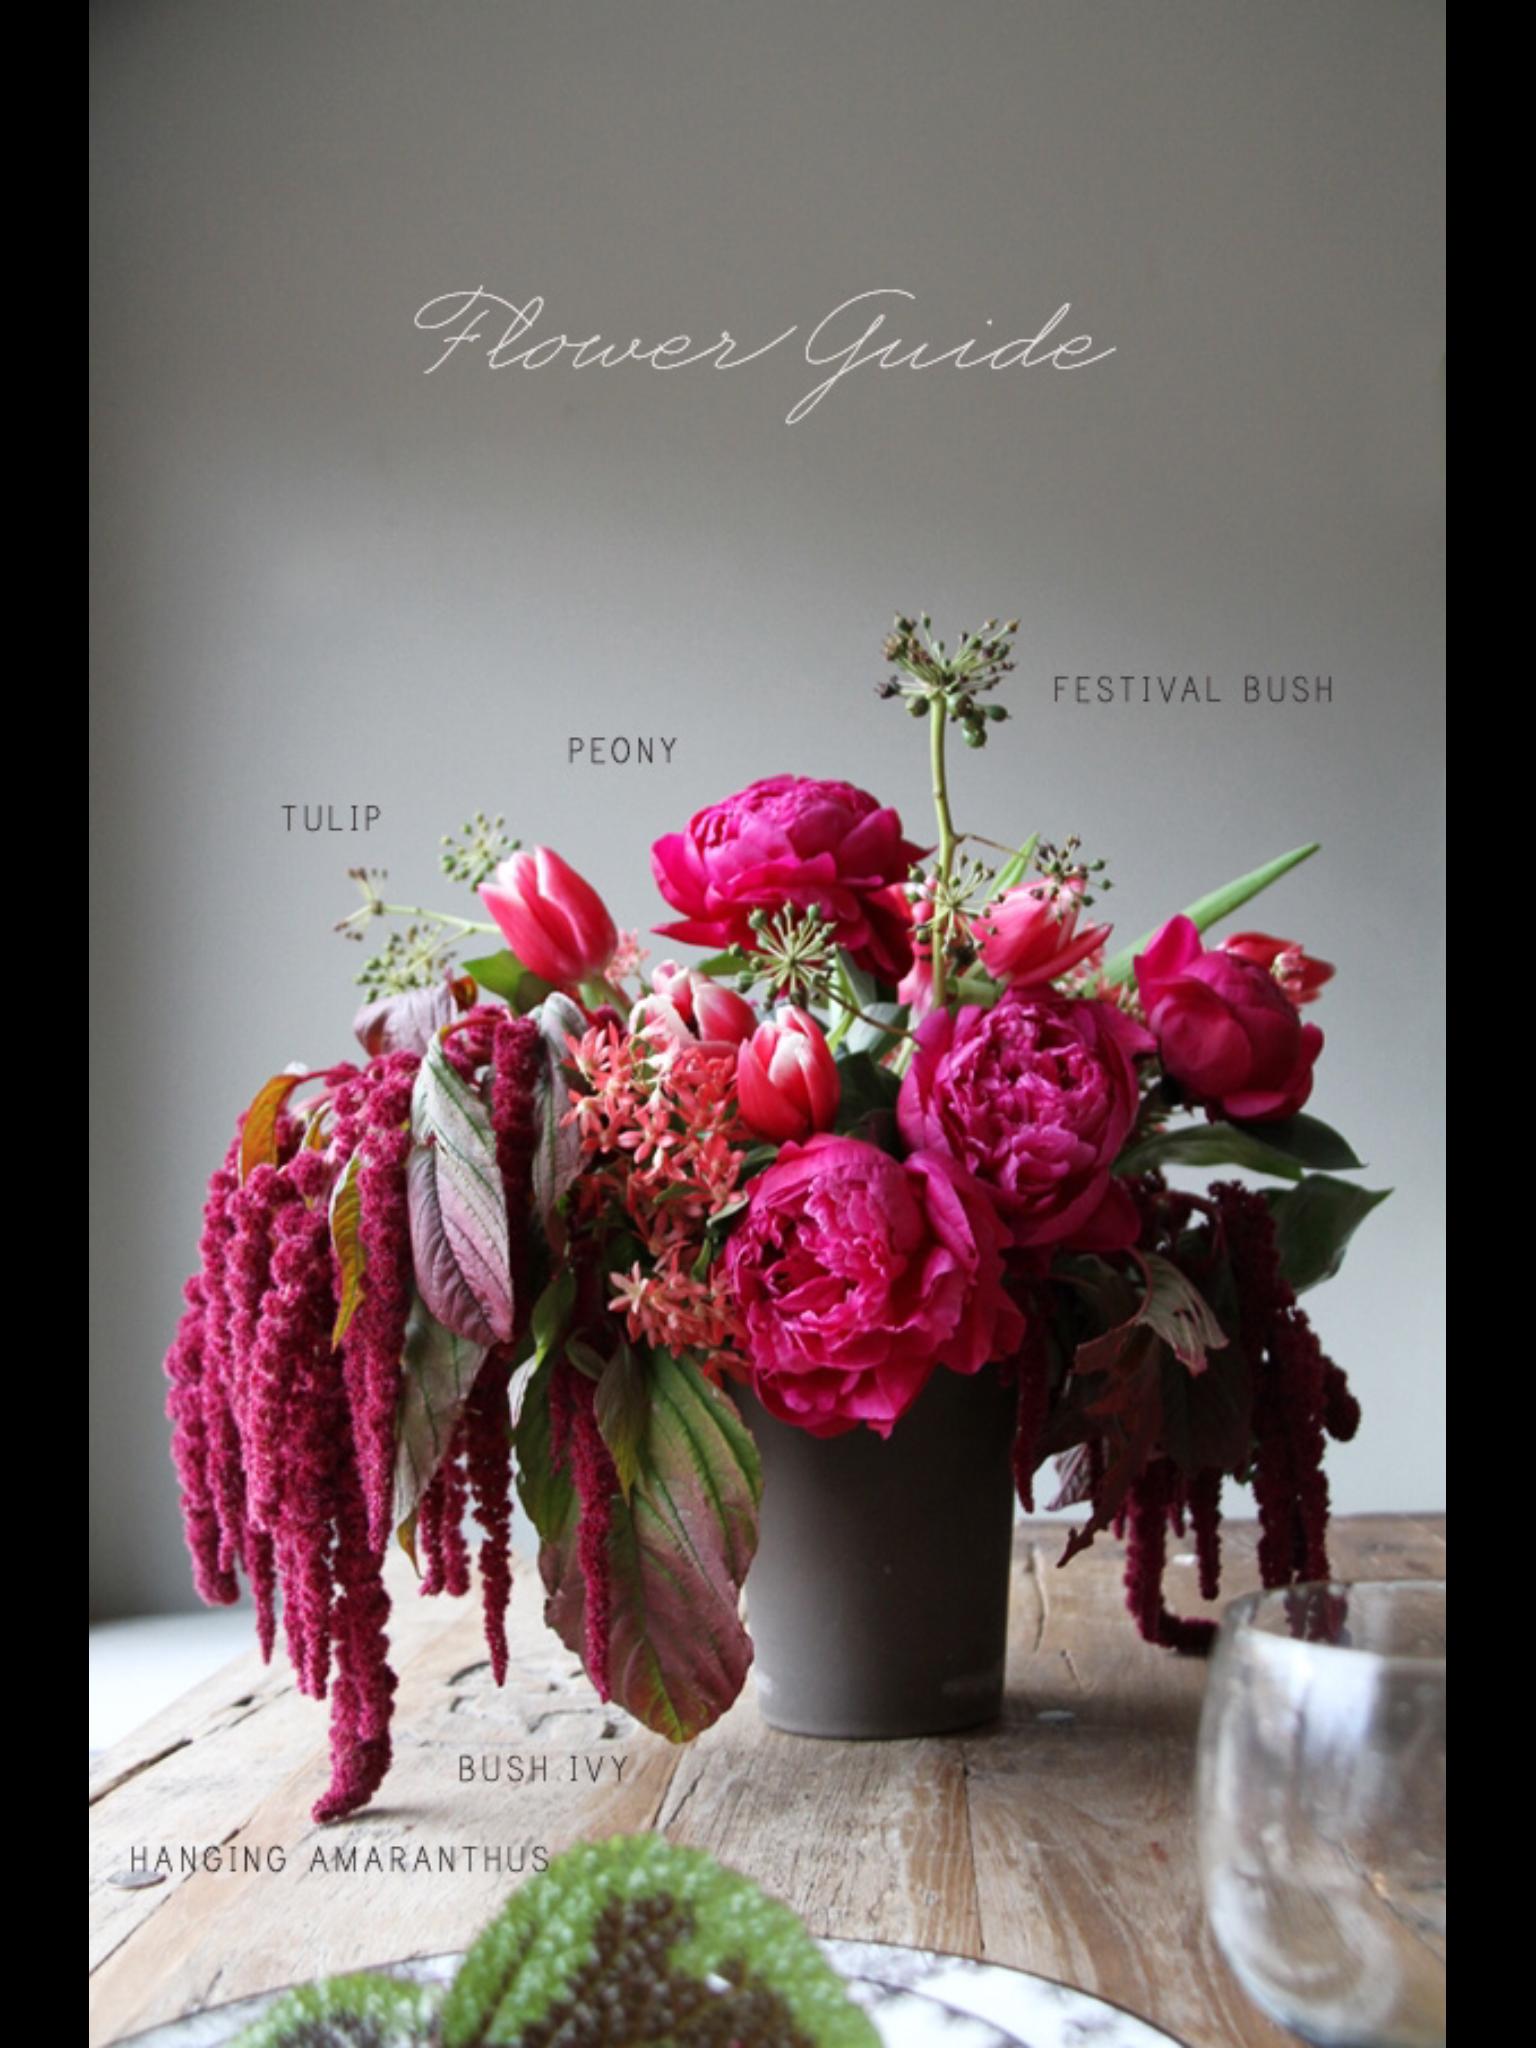 Pin By Yana On Flower Cover Pinterest Flower Arrangements